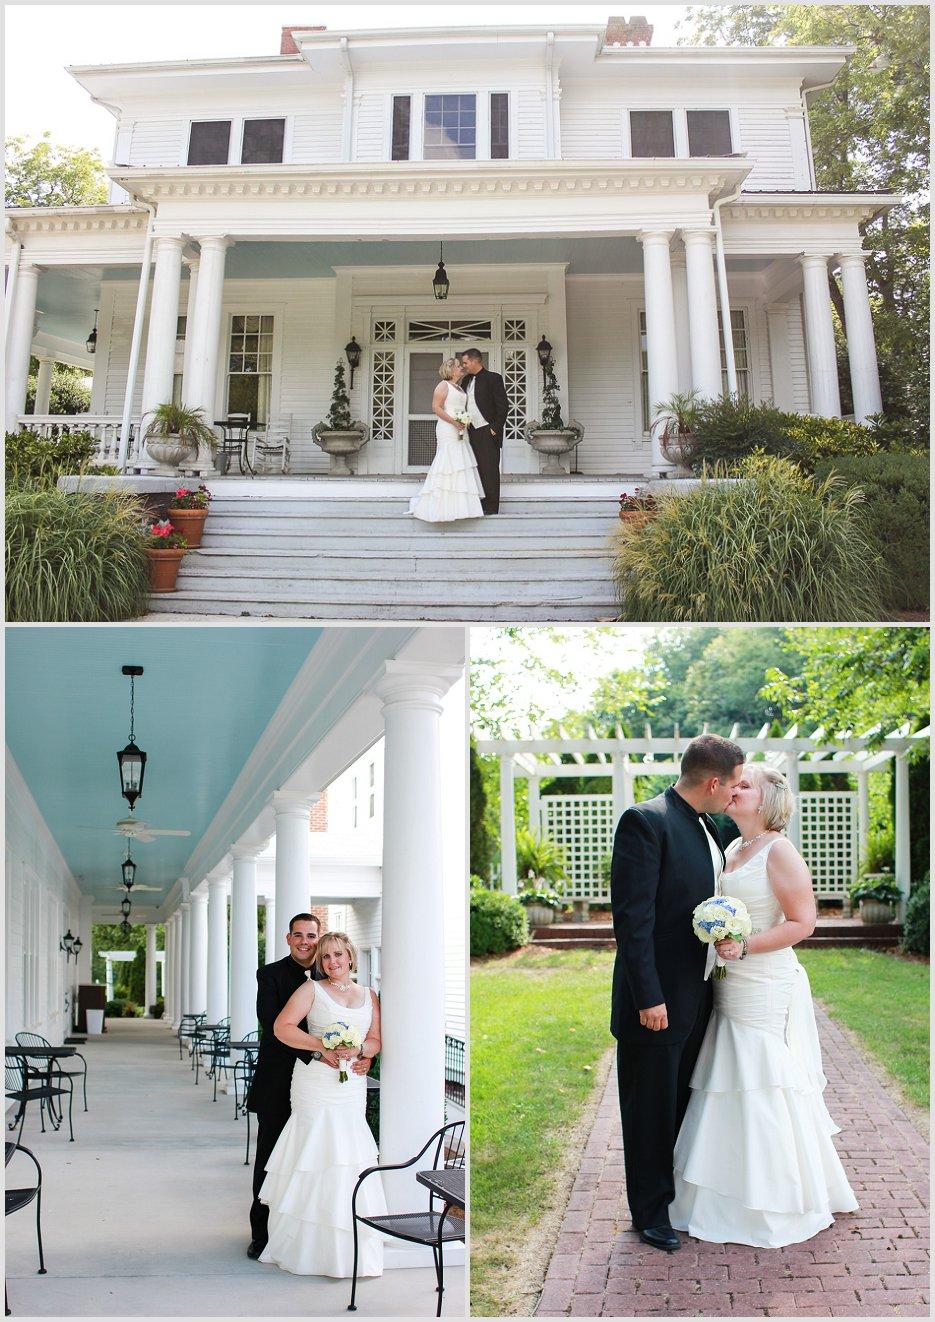 Braselton Stover House Wedding